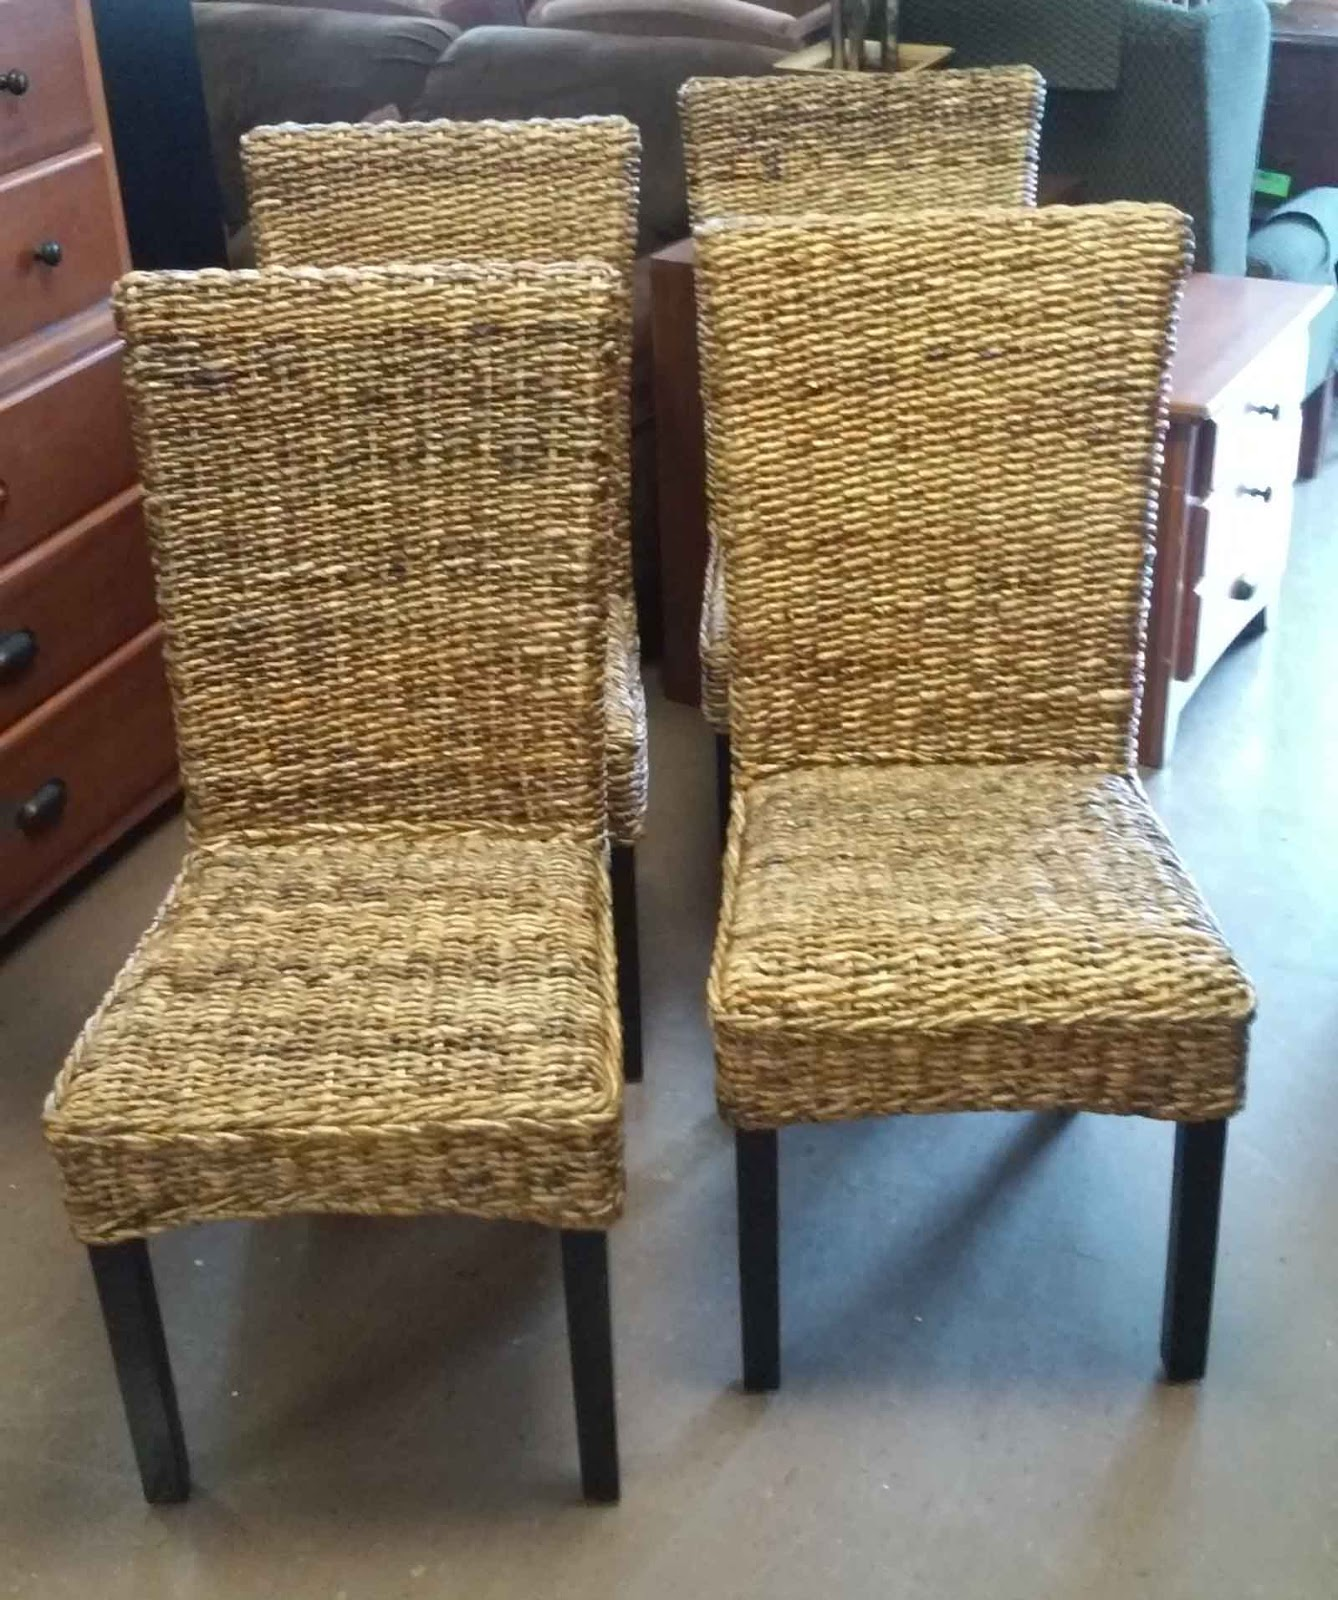 Genial Uhuru Furniture